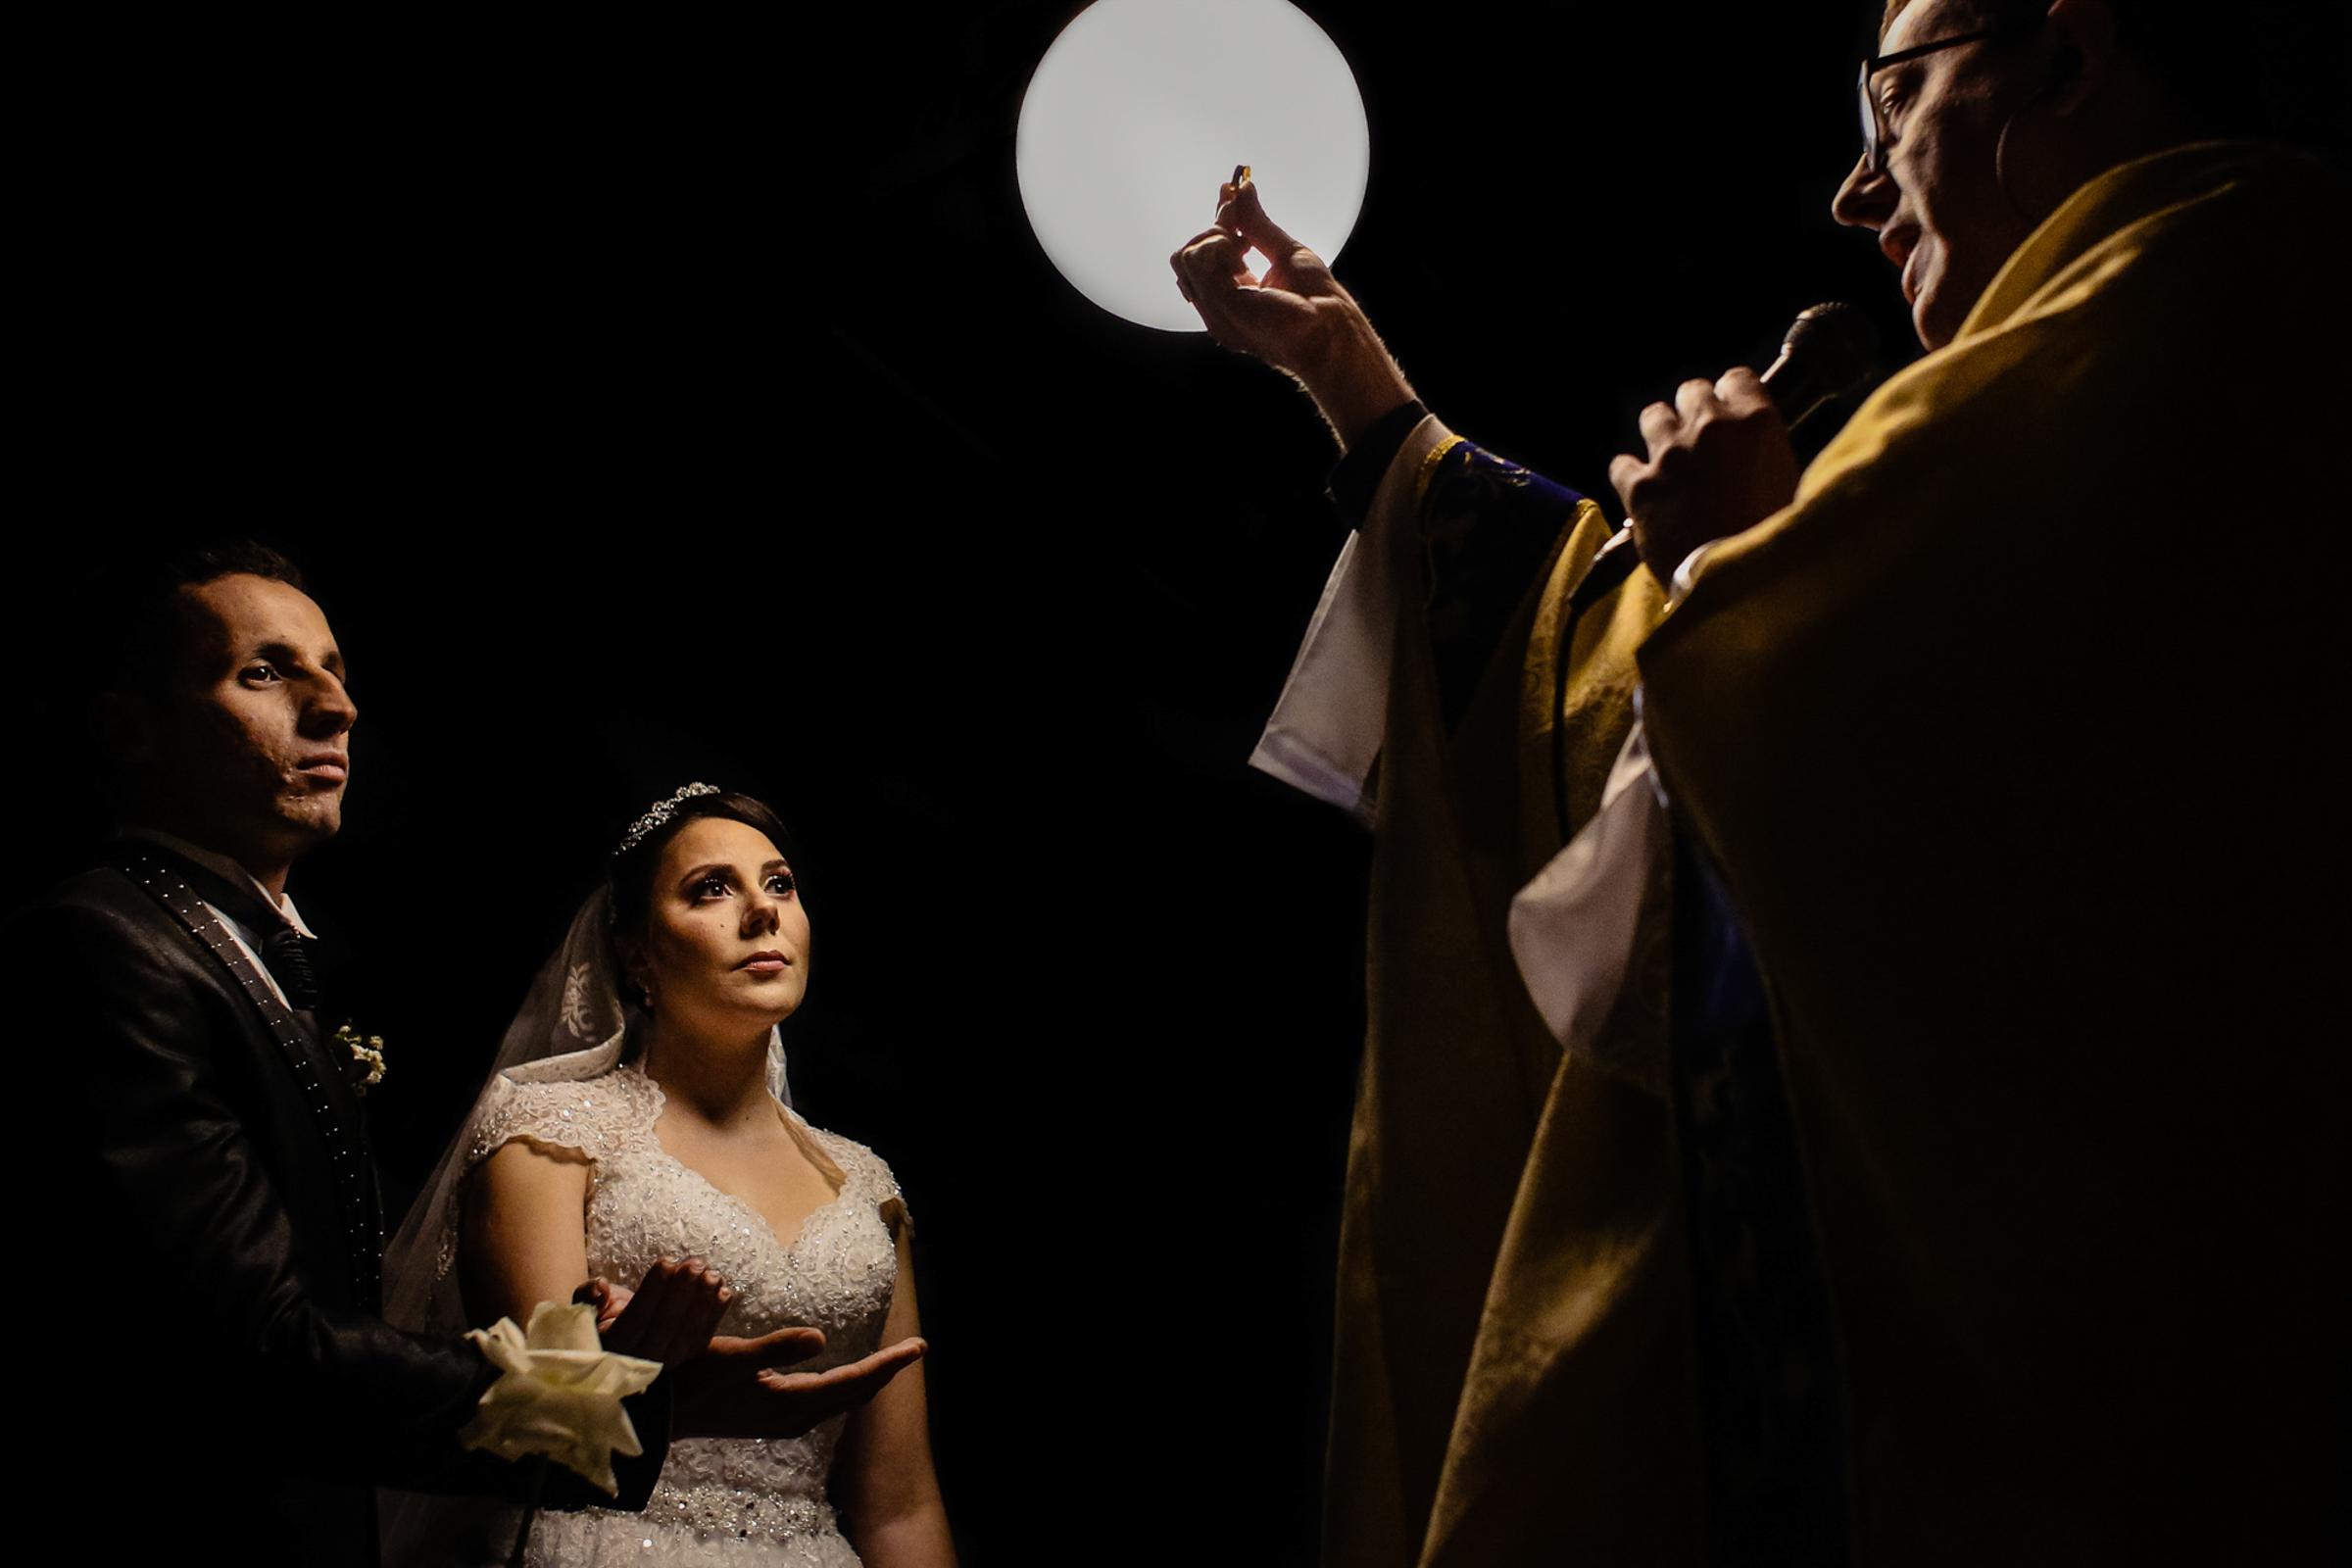 dramatic-ceremony-lighting-for-couple-and-priest-area-da-fotografia-portugal-photographer